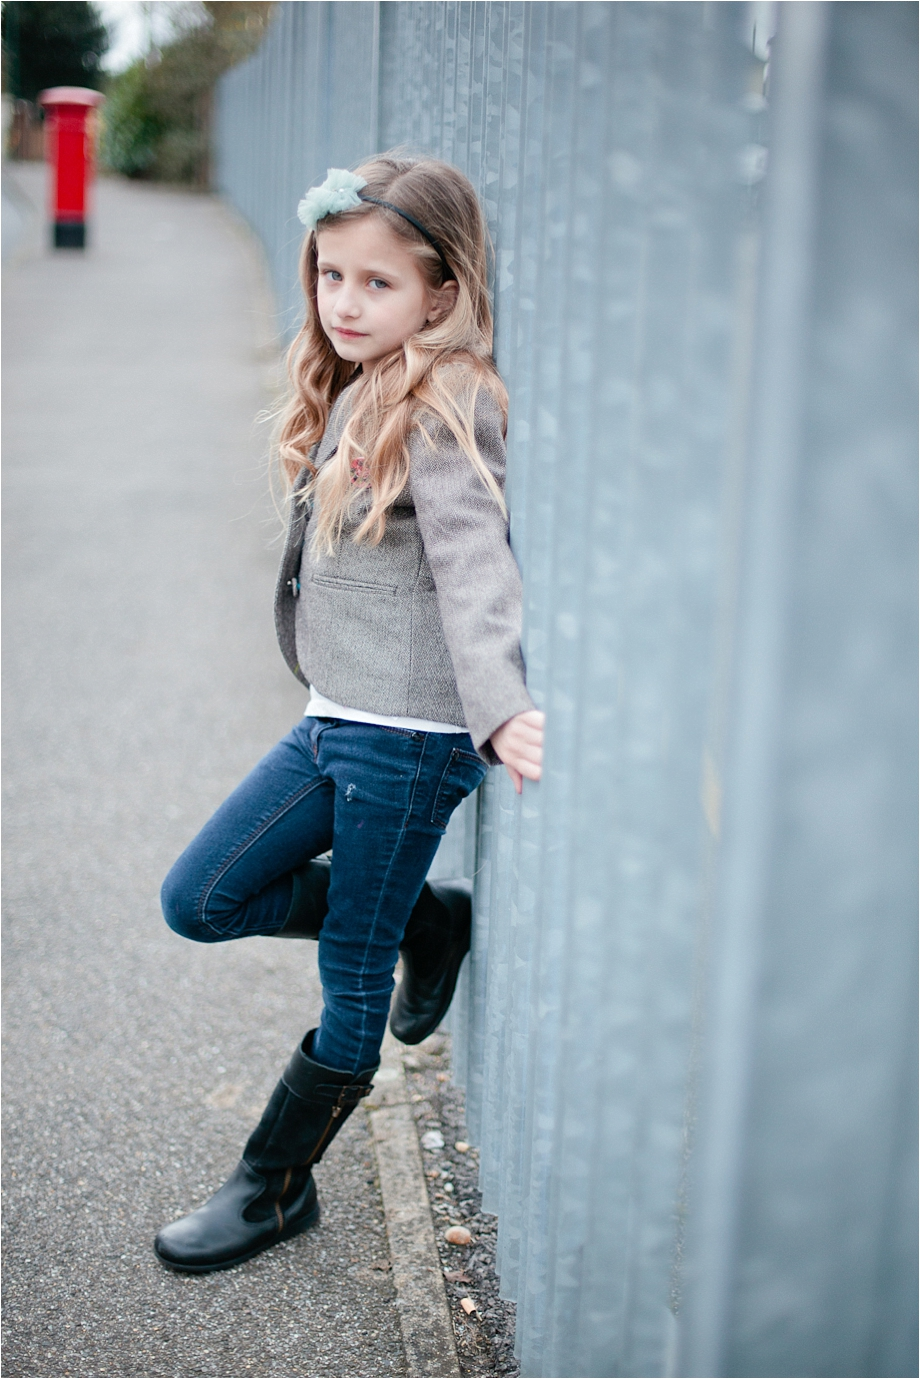 childrens-photography-surrey-eddie-judd-family-photographer_0004